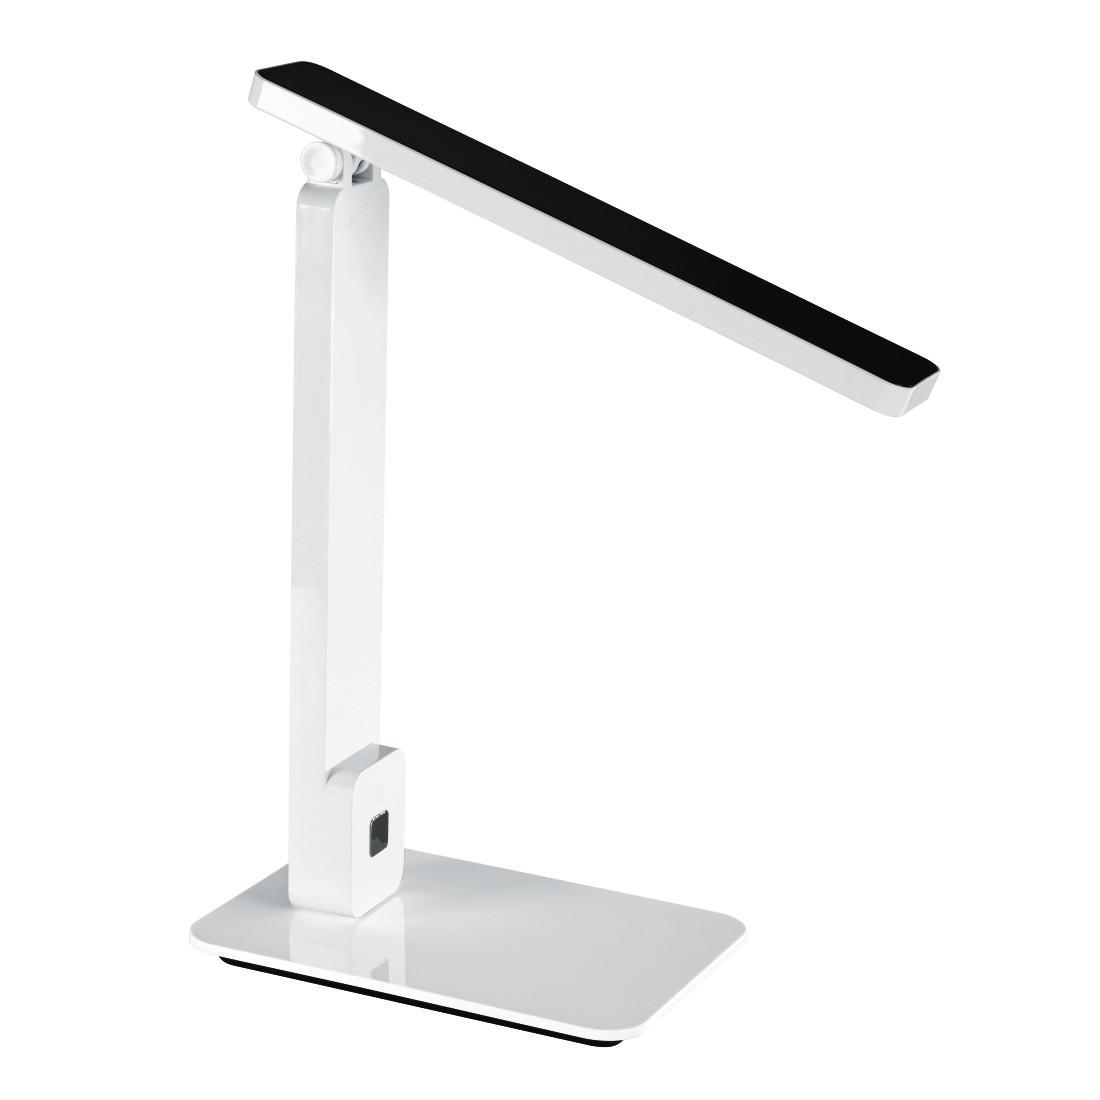 "Настолна лампа  HAMA ""SL40"" 112295, Димер, Бял/Черен"